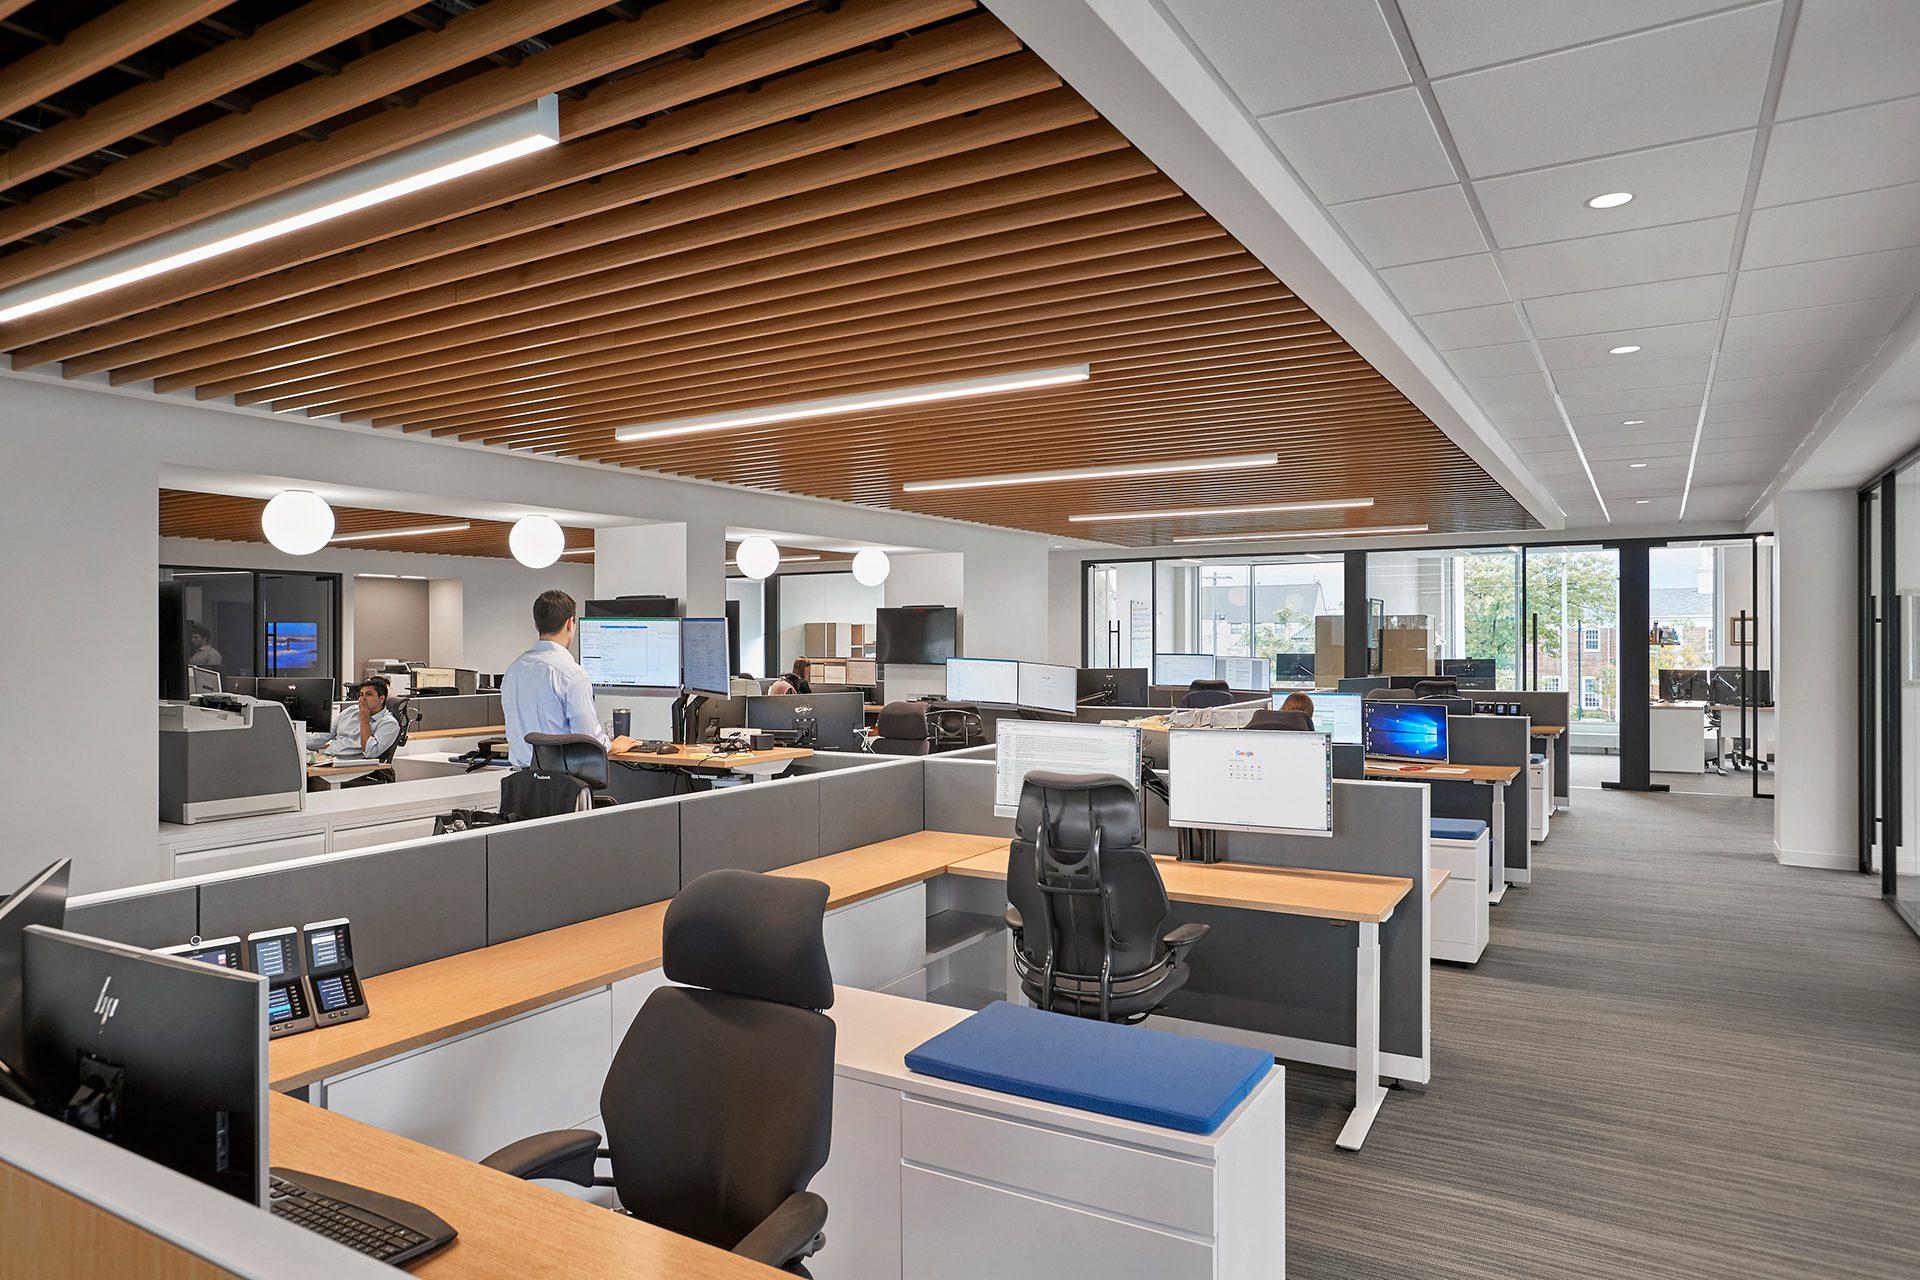 Energy Capital Partners (ECP) open workspace